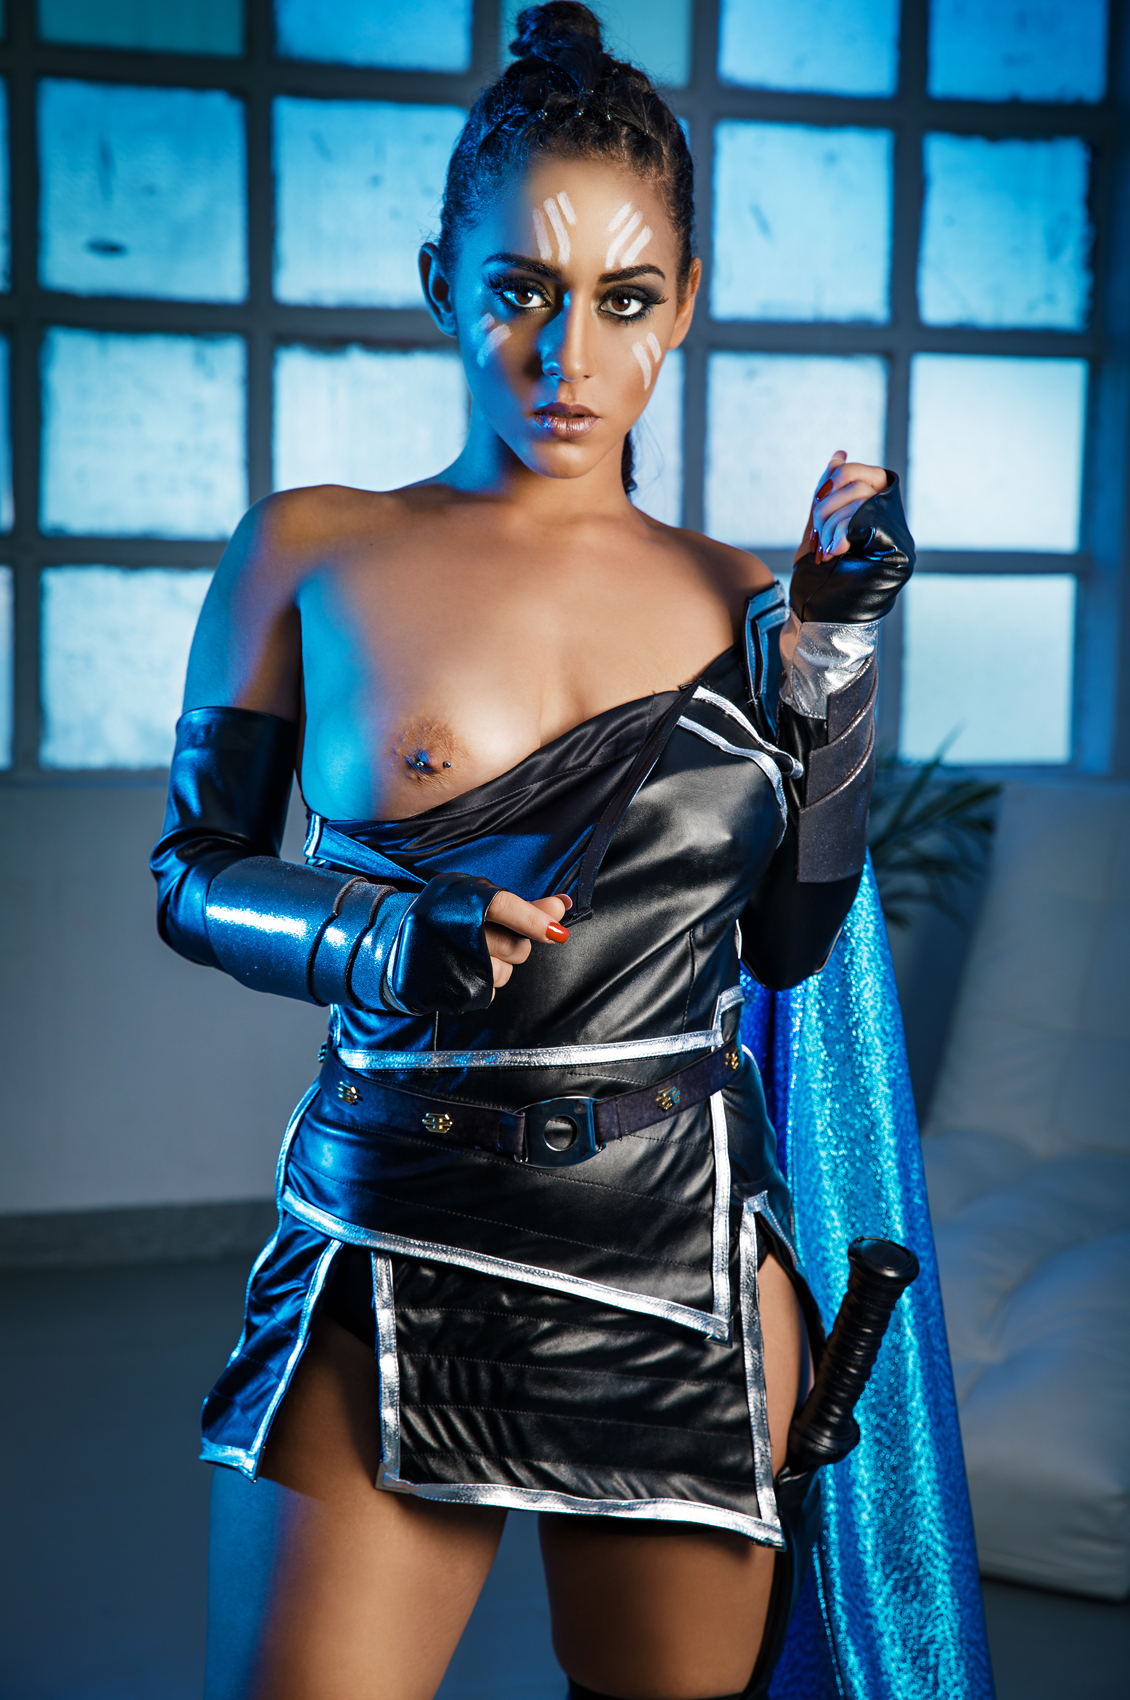 Aysha X's VR Porn Videos, Bio & Free Nude Pics